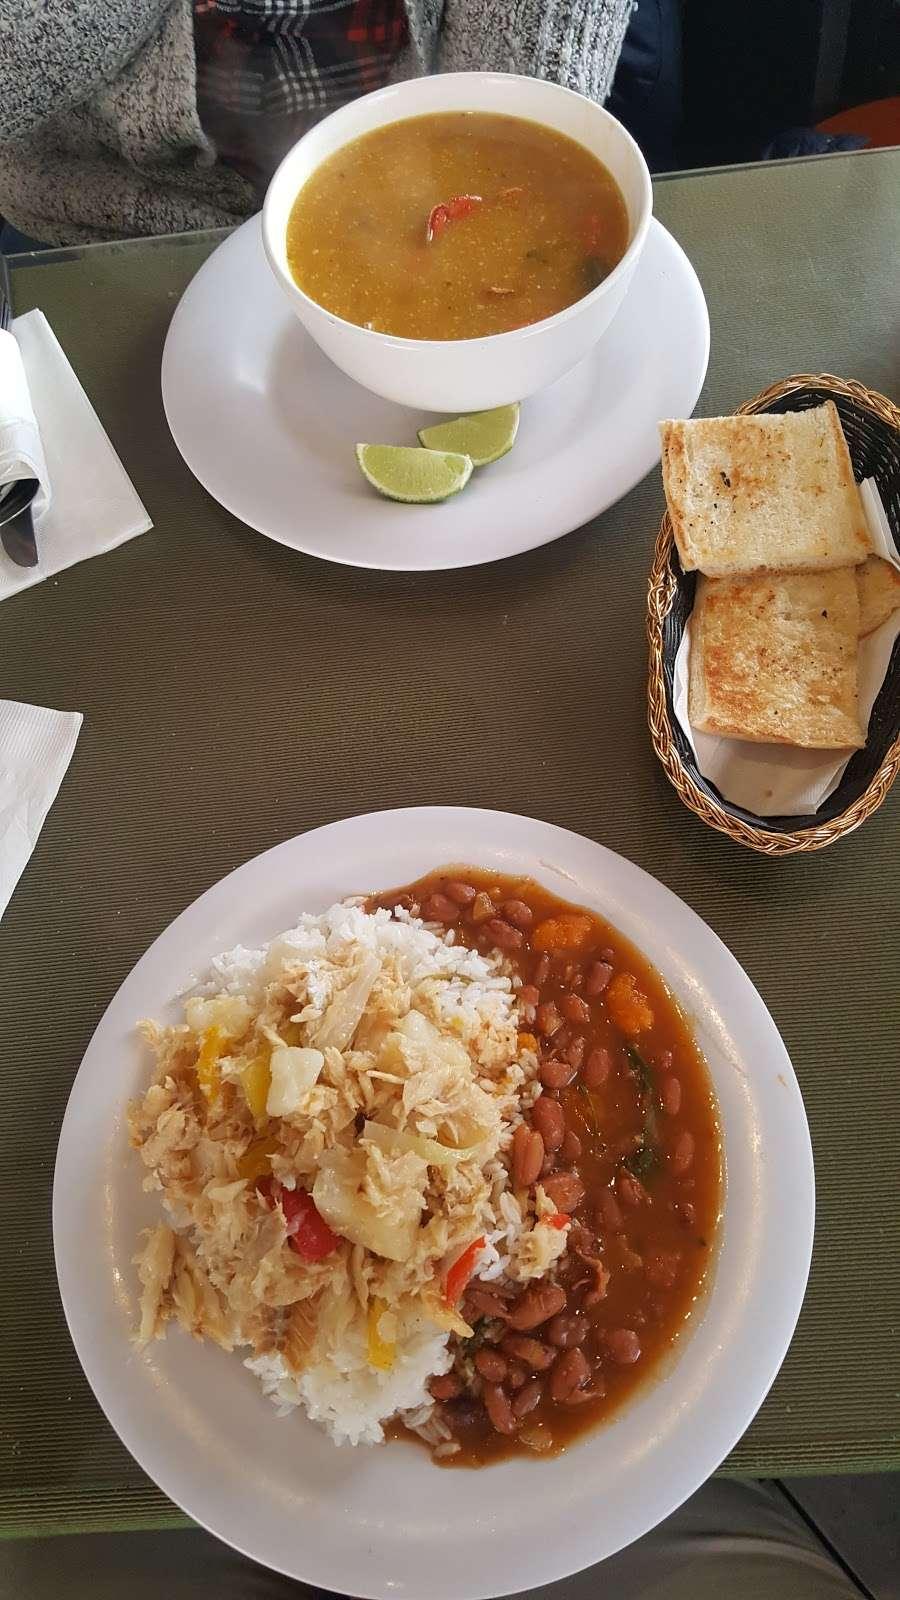 Fiesta Cafe and Bar - cafe  | Photo 2 of 10 | Address: 4640 Third Ave, Bronx, NY 10458, USA | Phone: (718) 733-2211